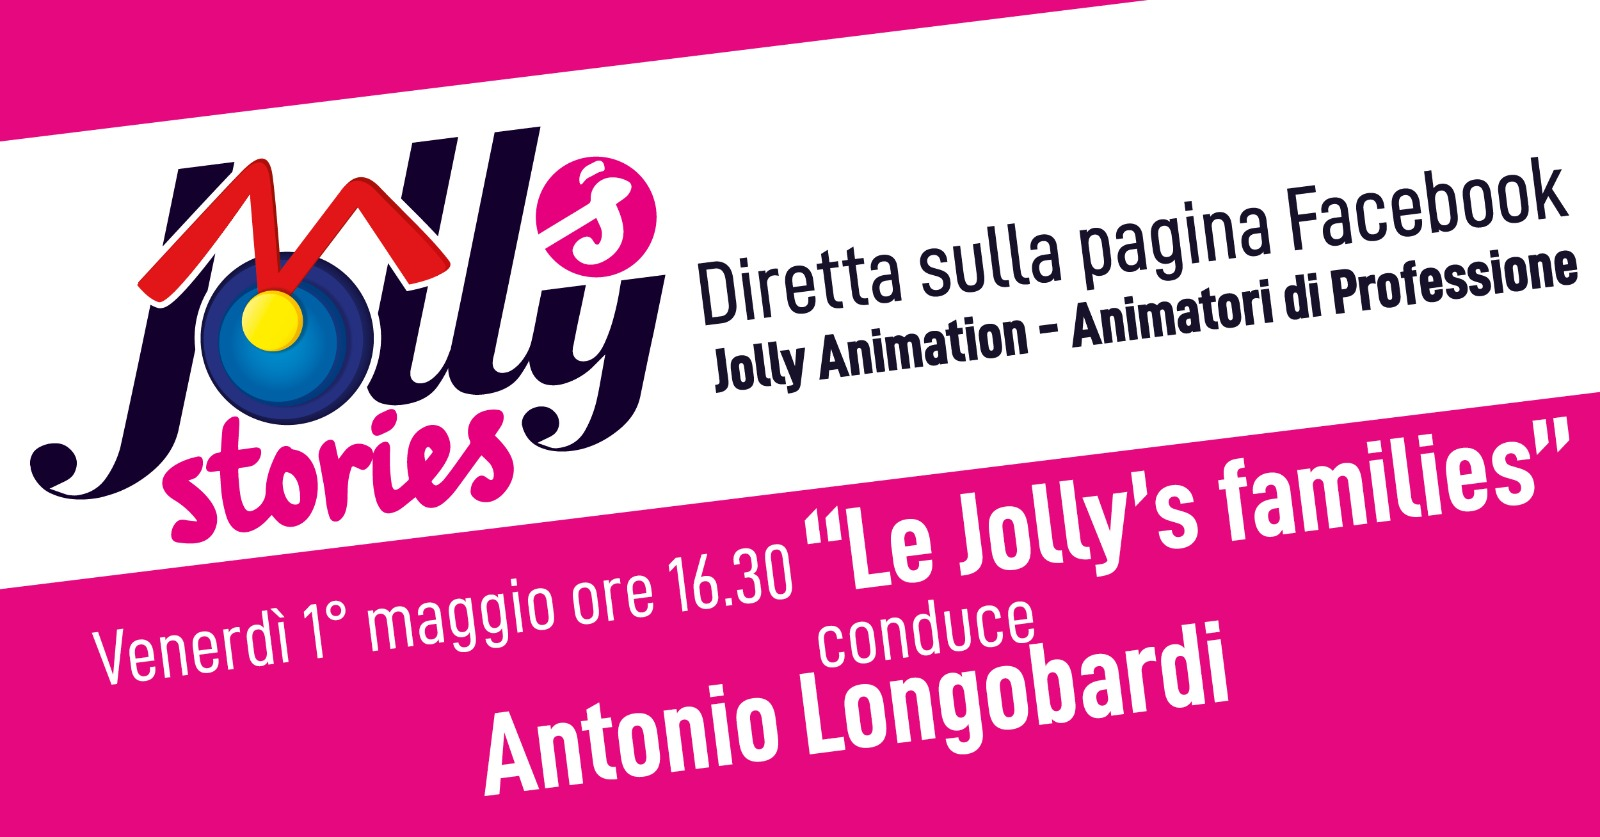 Le Jolly's Families in diretta su Facebook